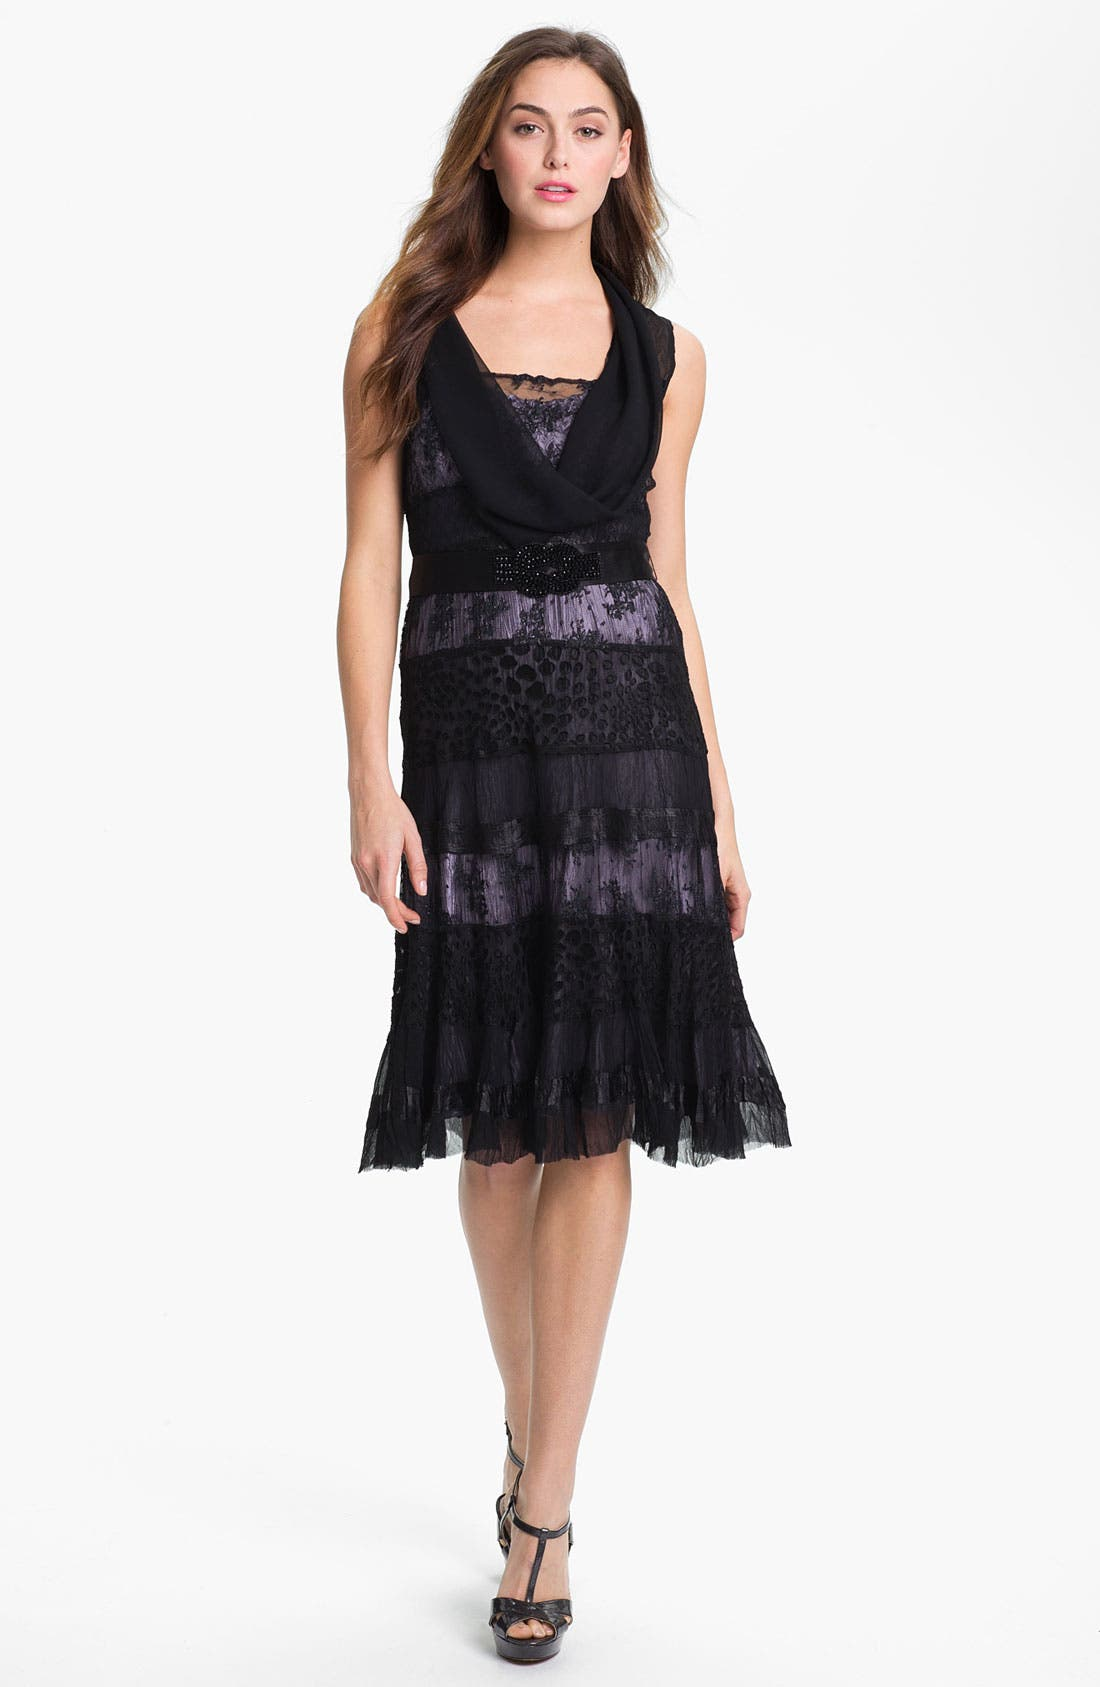 Alternate Image 1 Selected - Black by Komarov Lace Panel A-Line Dress